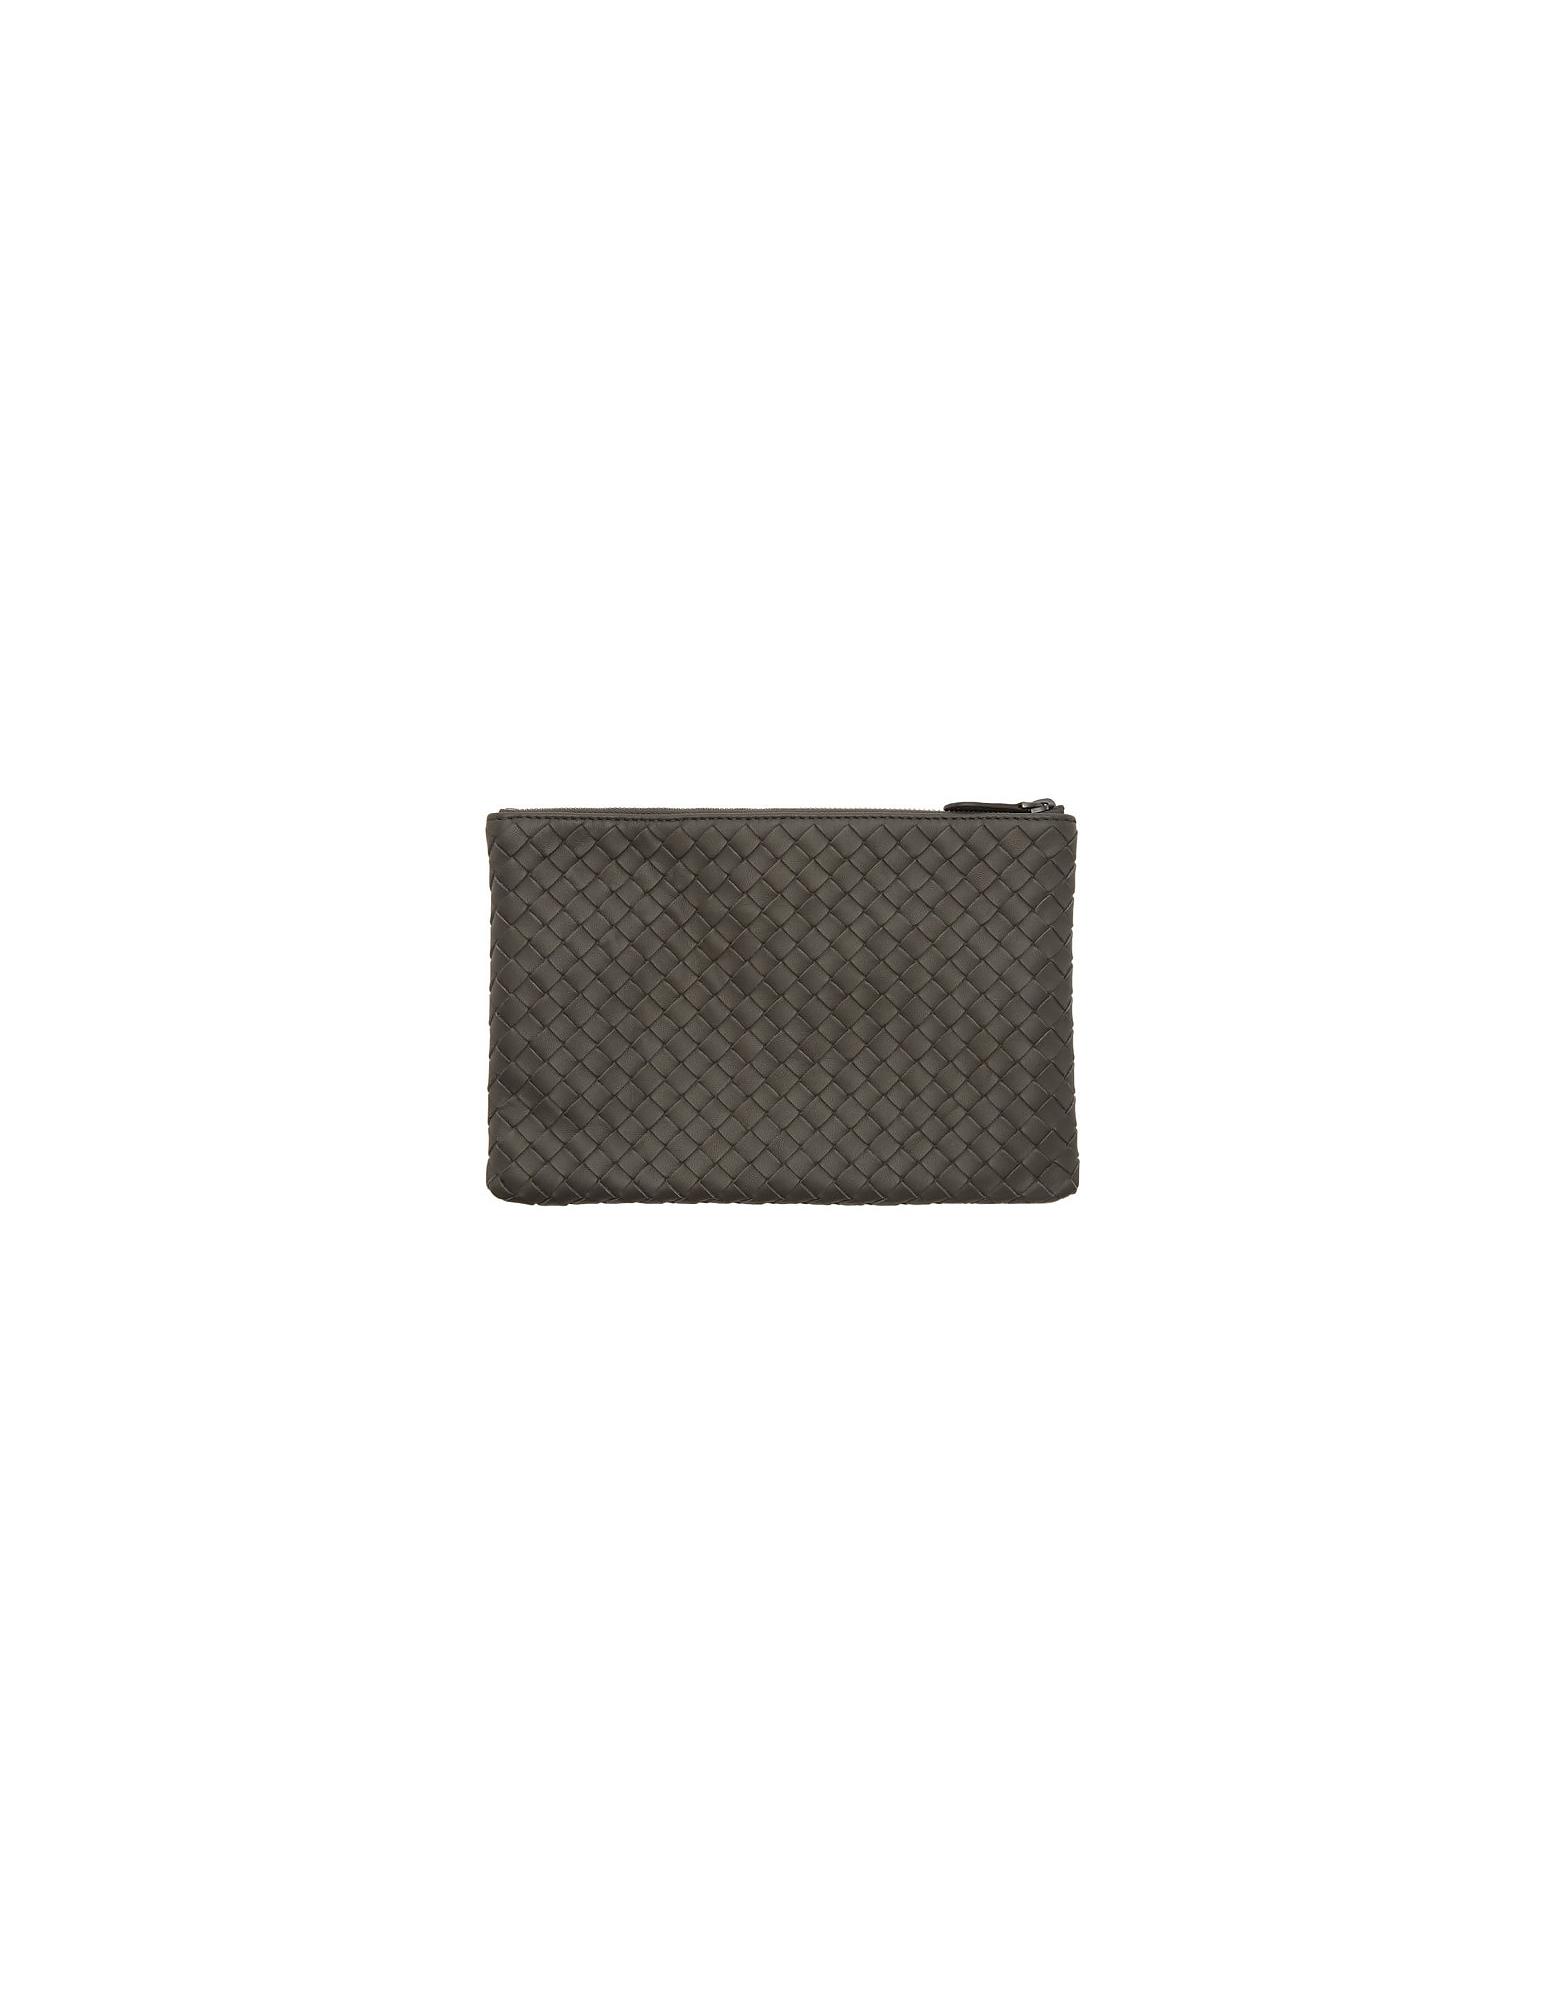 Bottega Veneta Designer Handbags, Grey Small Intrecciato Pouch